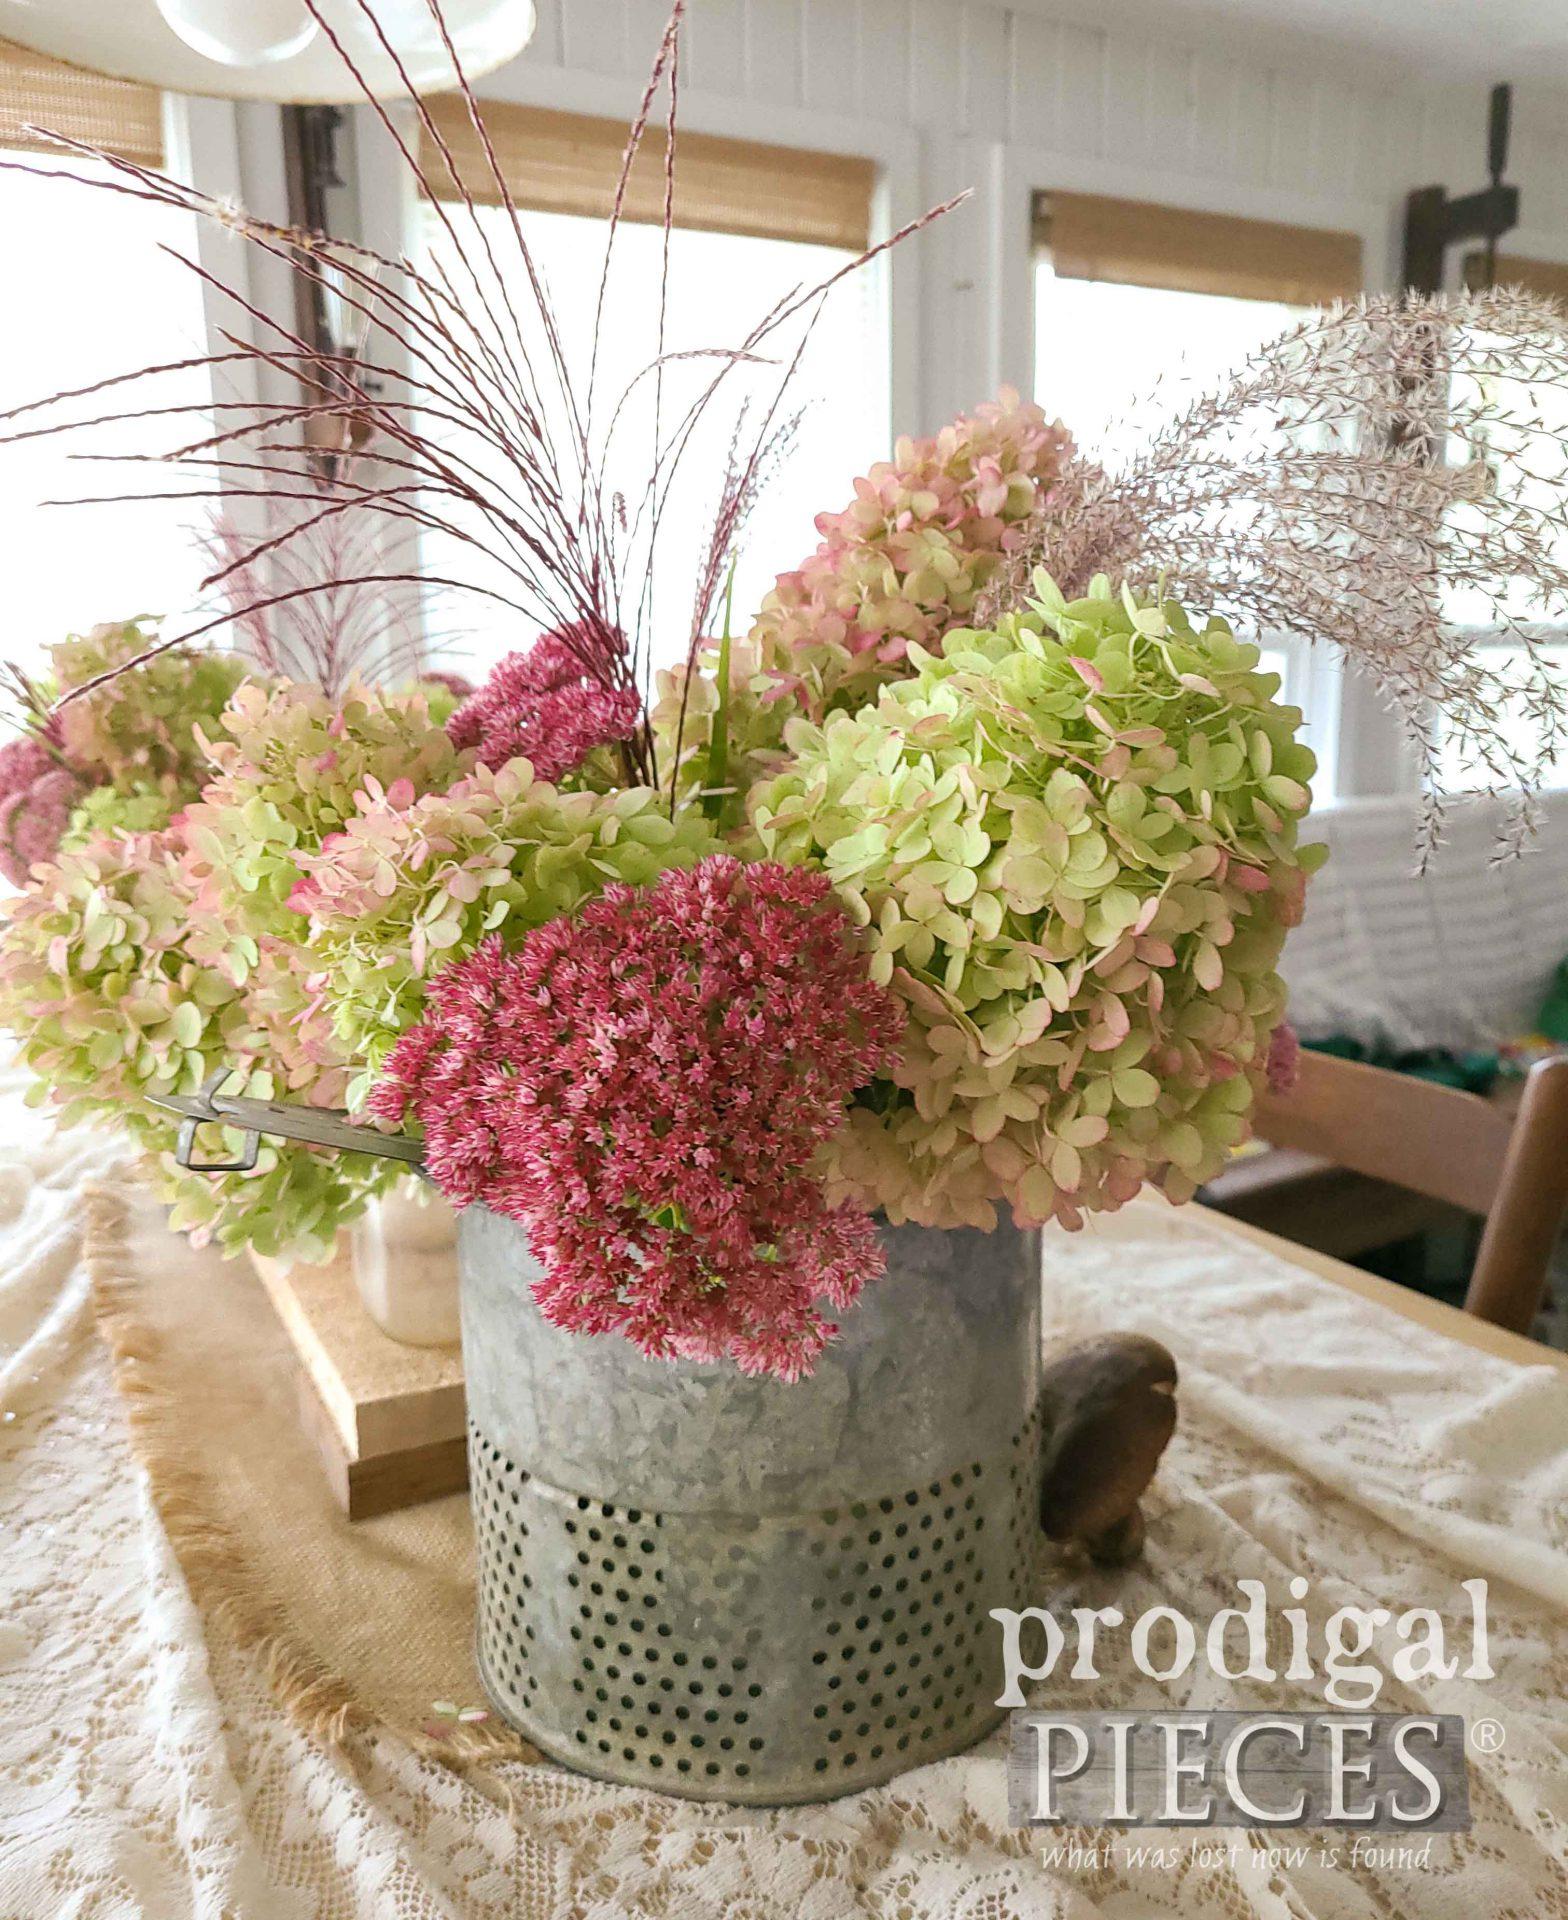 Autumn Flower Display by Prodigal Pieces | prodigalpieces.com #prodigalpieces #farmhouse #flowers #home #homedecor #diy